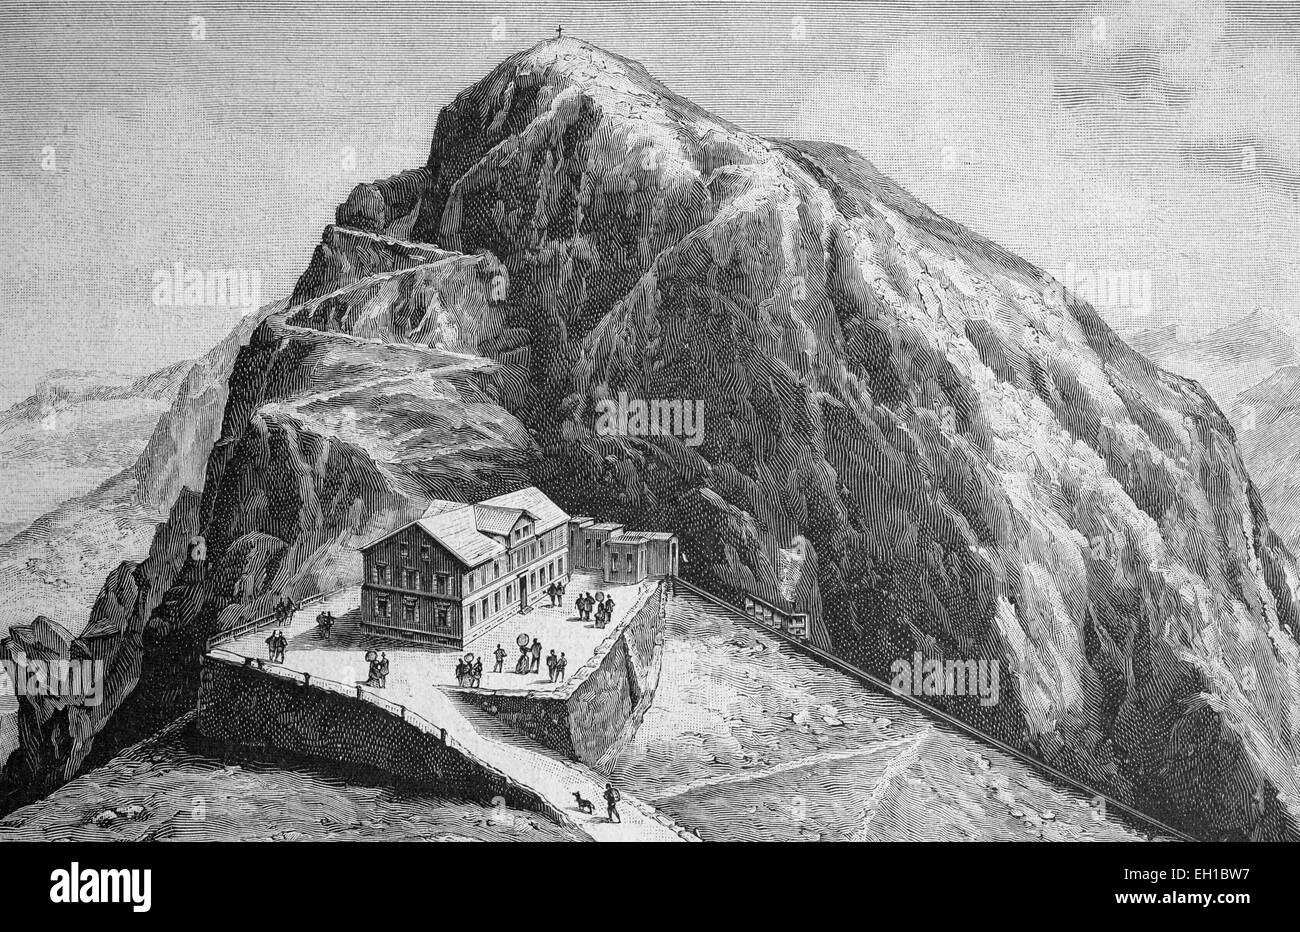 Summit of Pilatus mountain, Pilatuskulm Hotel, Switzerland, historical picture, about 1893 - Stock Image